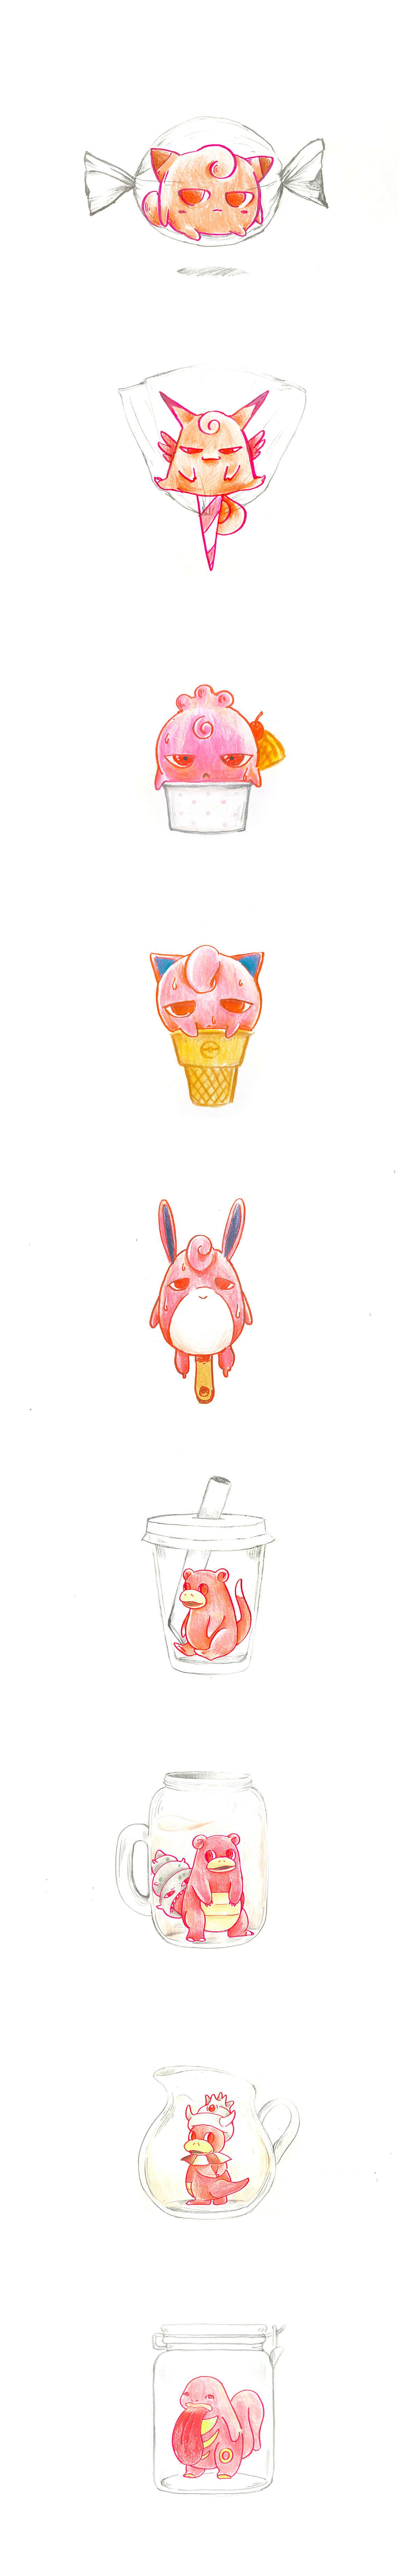 Pokemon Inktober by Theresia Tarisa